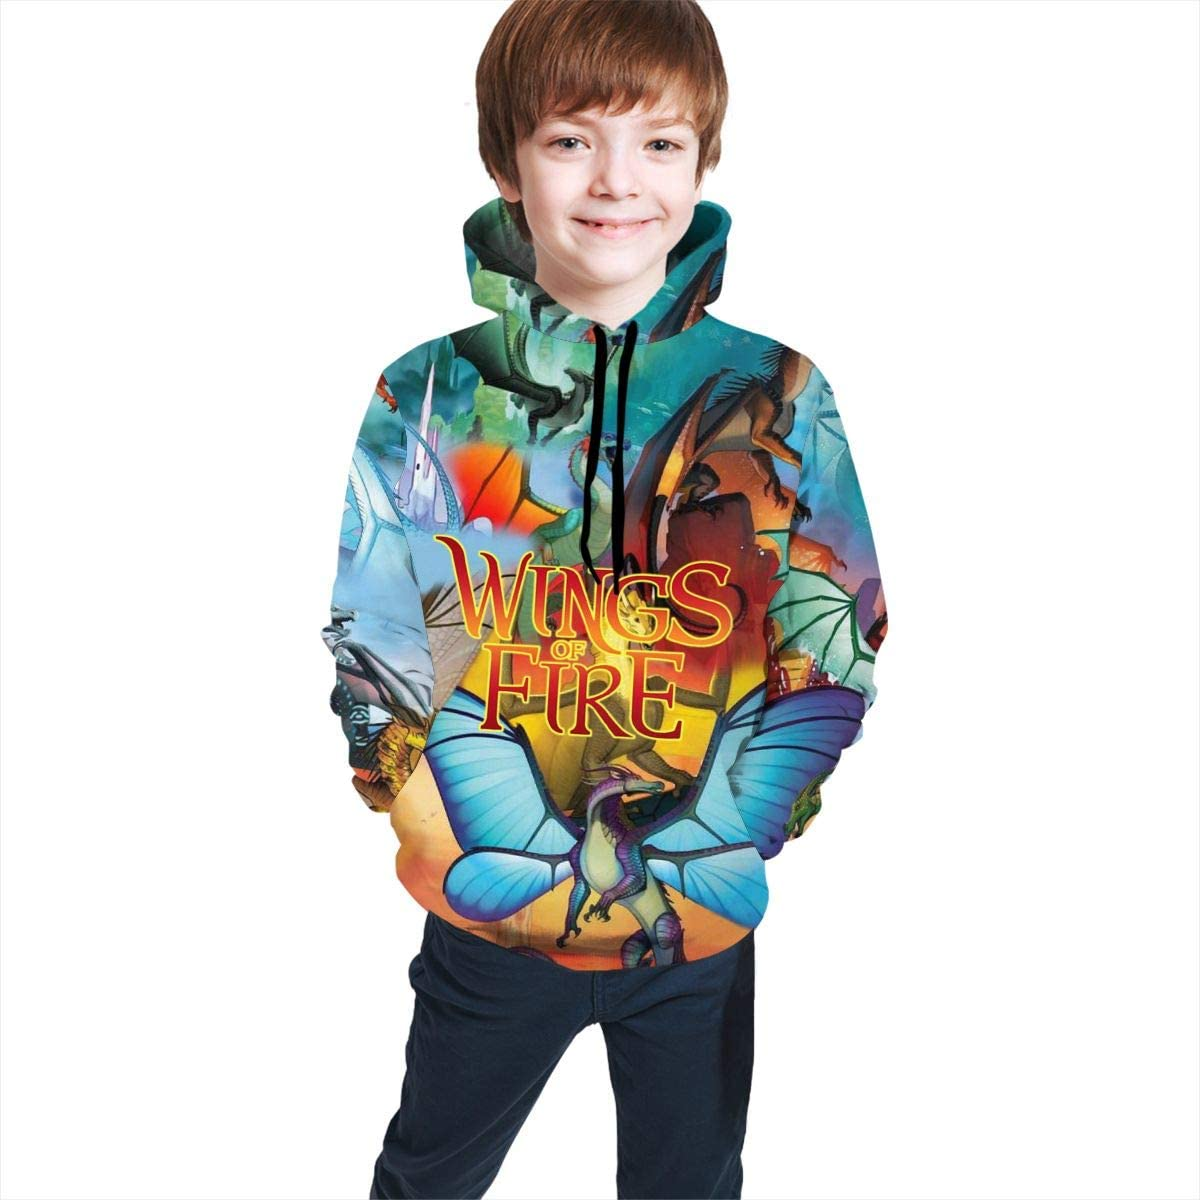 JHSZCSSDZS 3D Print Dragon Teen Black Quantity limited Sweatshirt NEW before selling Hoodie Boys For